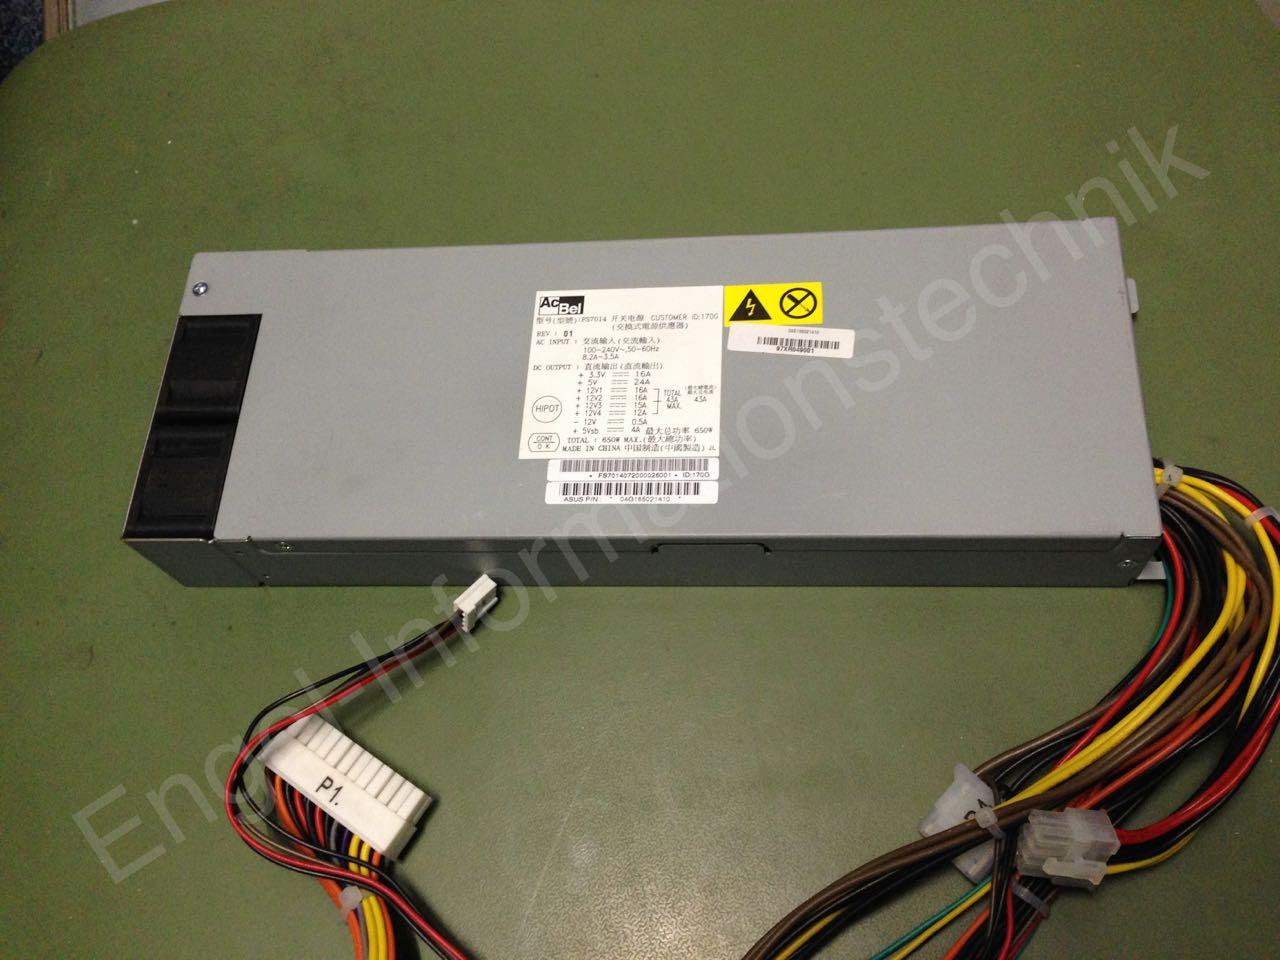 AcBel FS-7014